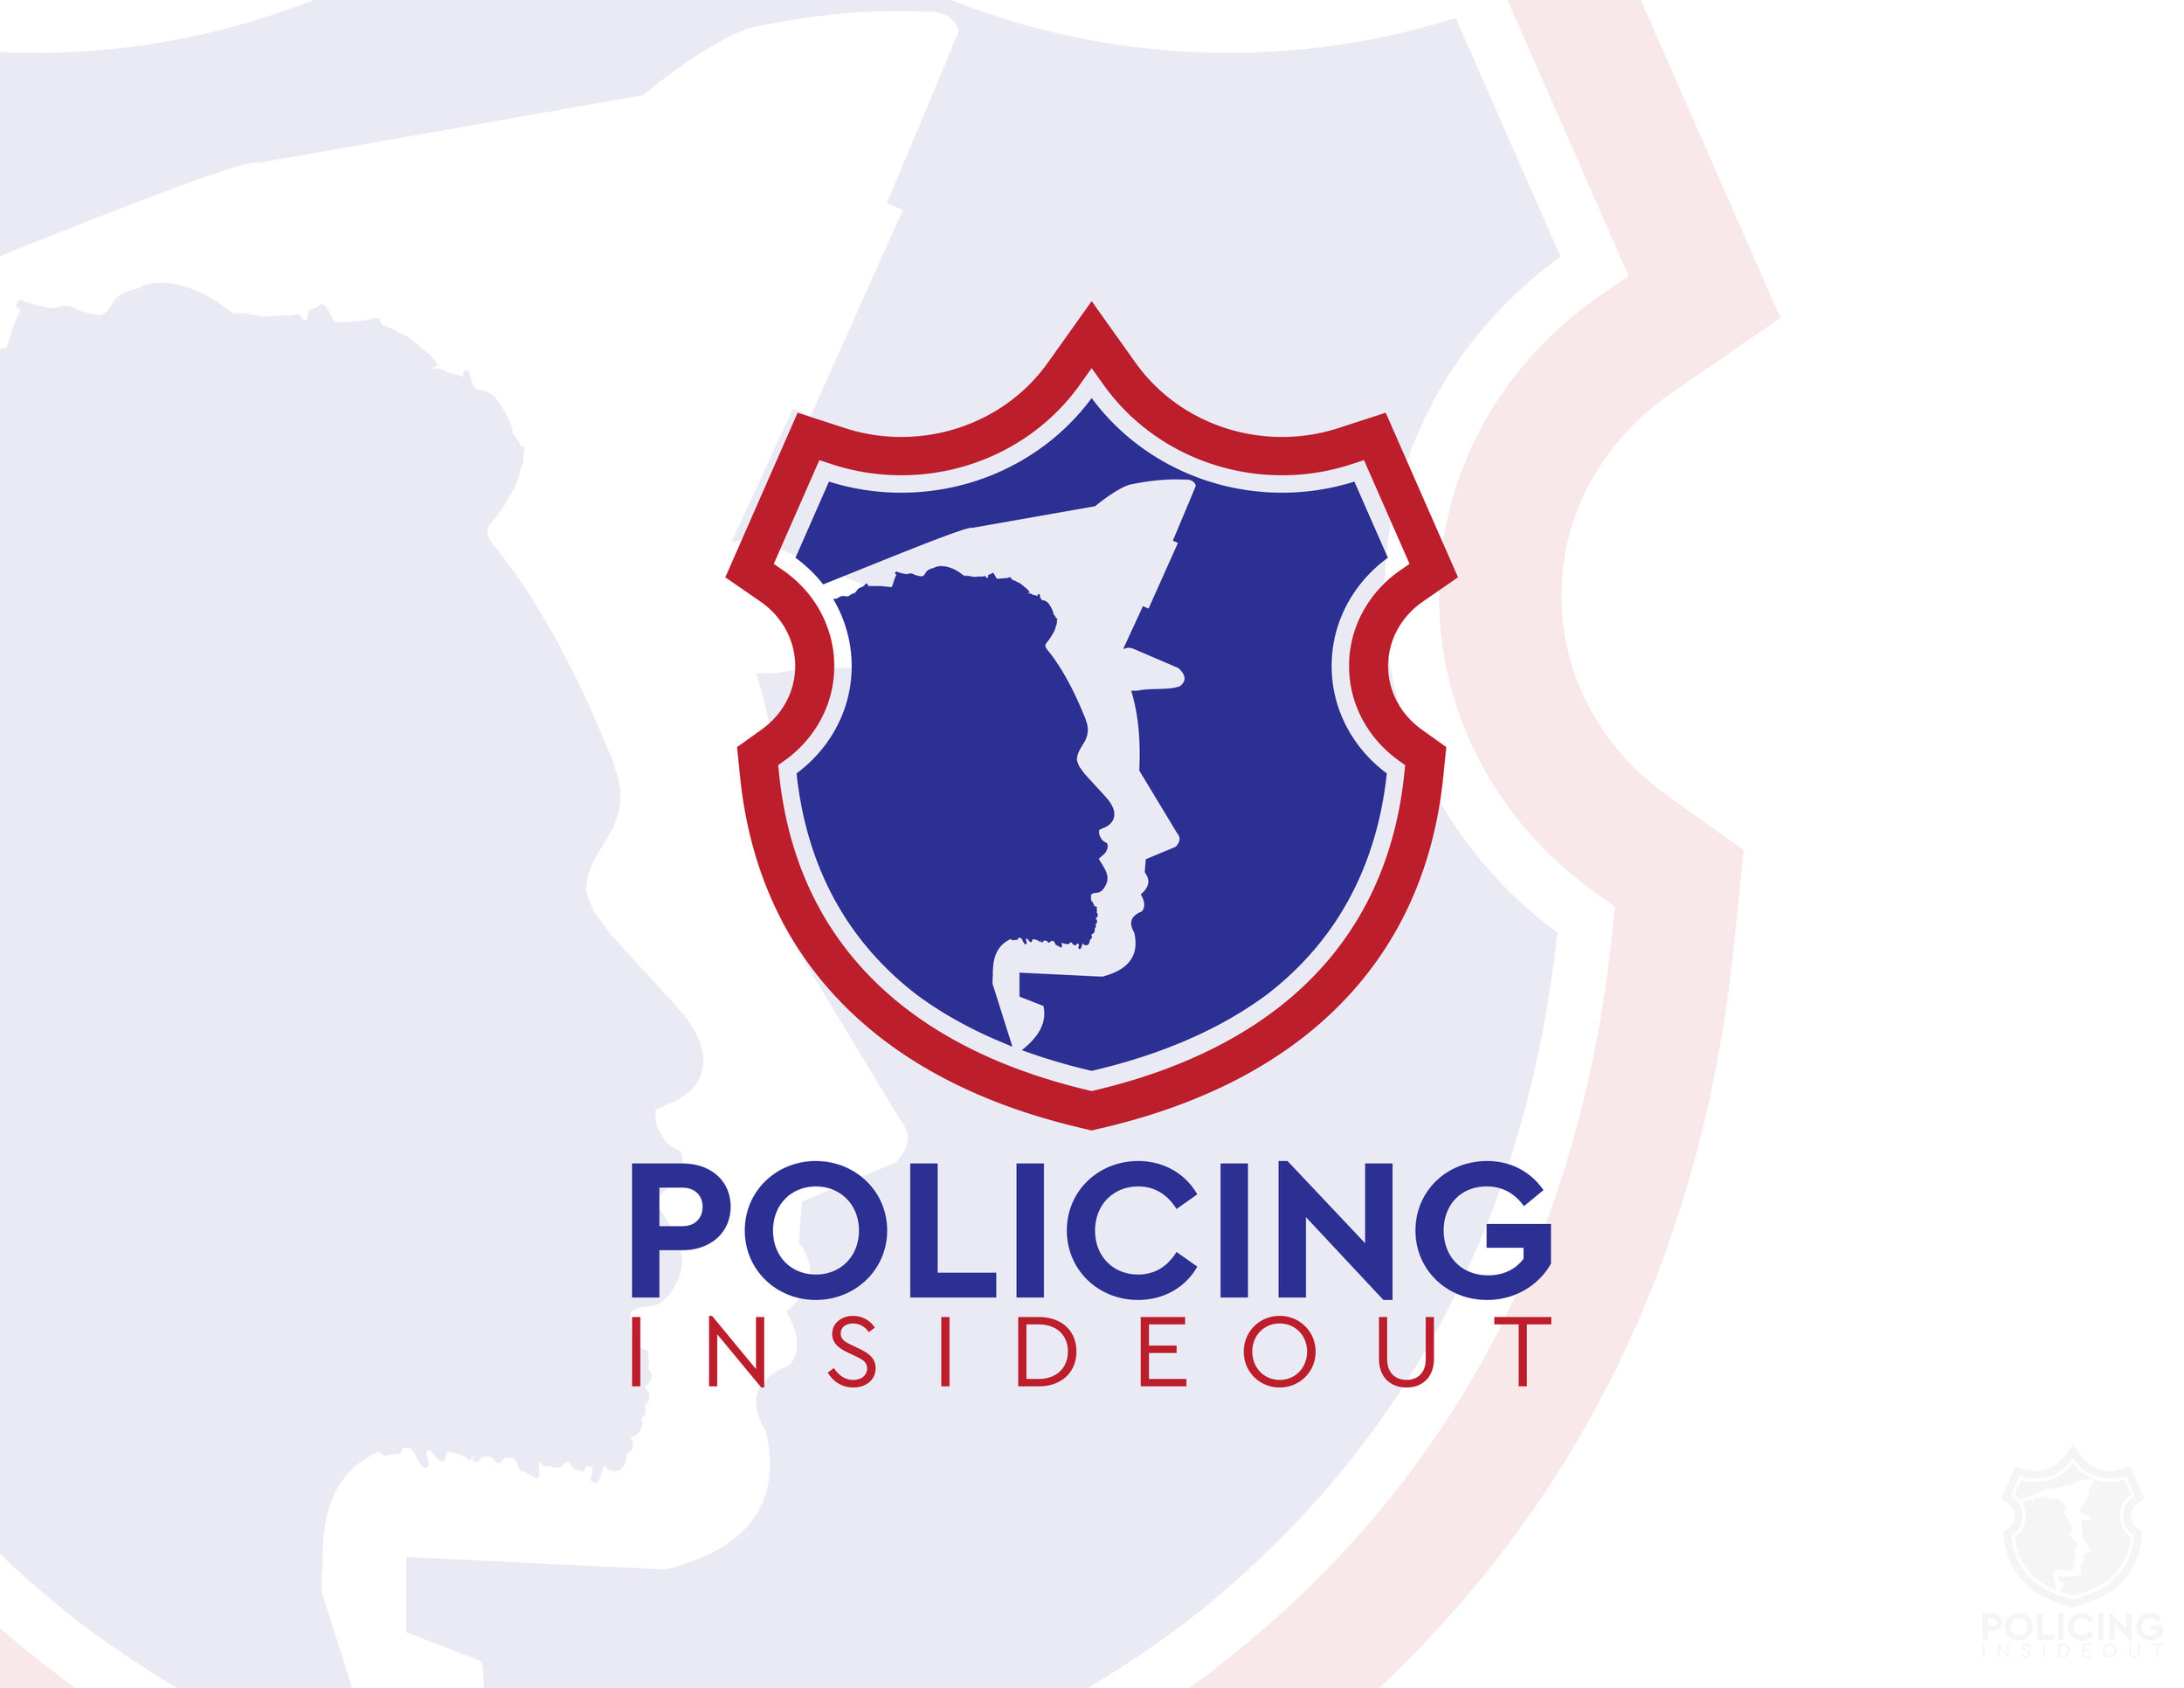 PolicingInsideOut-Logo-Final1.jpg